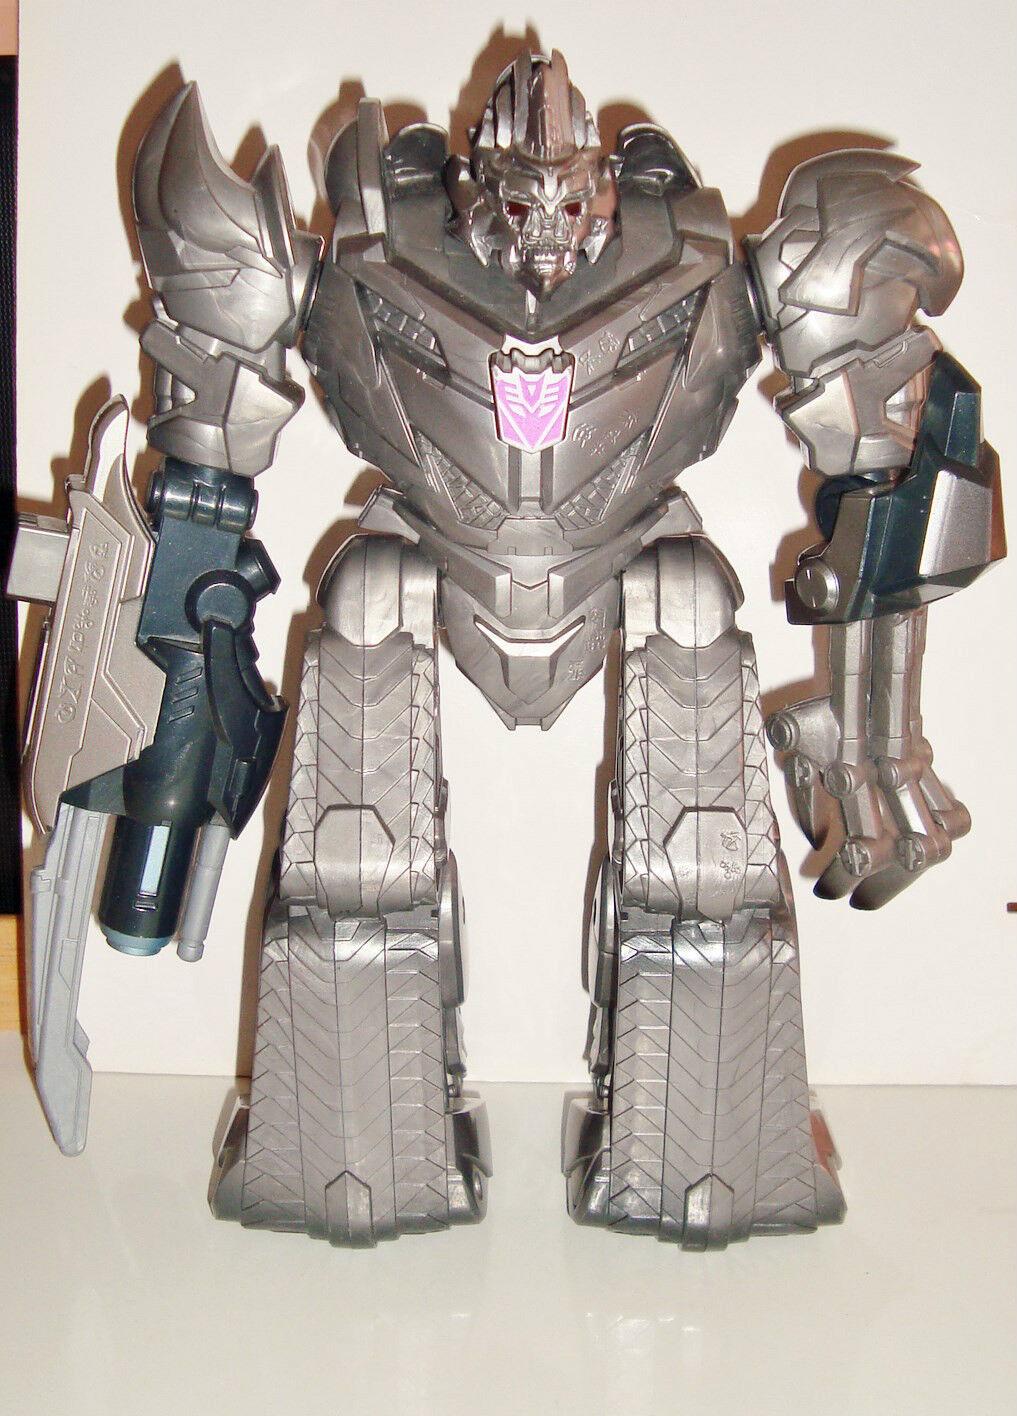 Figurine Large Transformers Decepticon Sound - Hasbro 2009 (27x22cm)